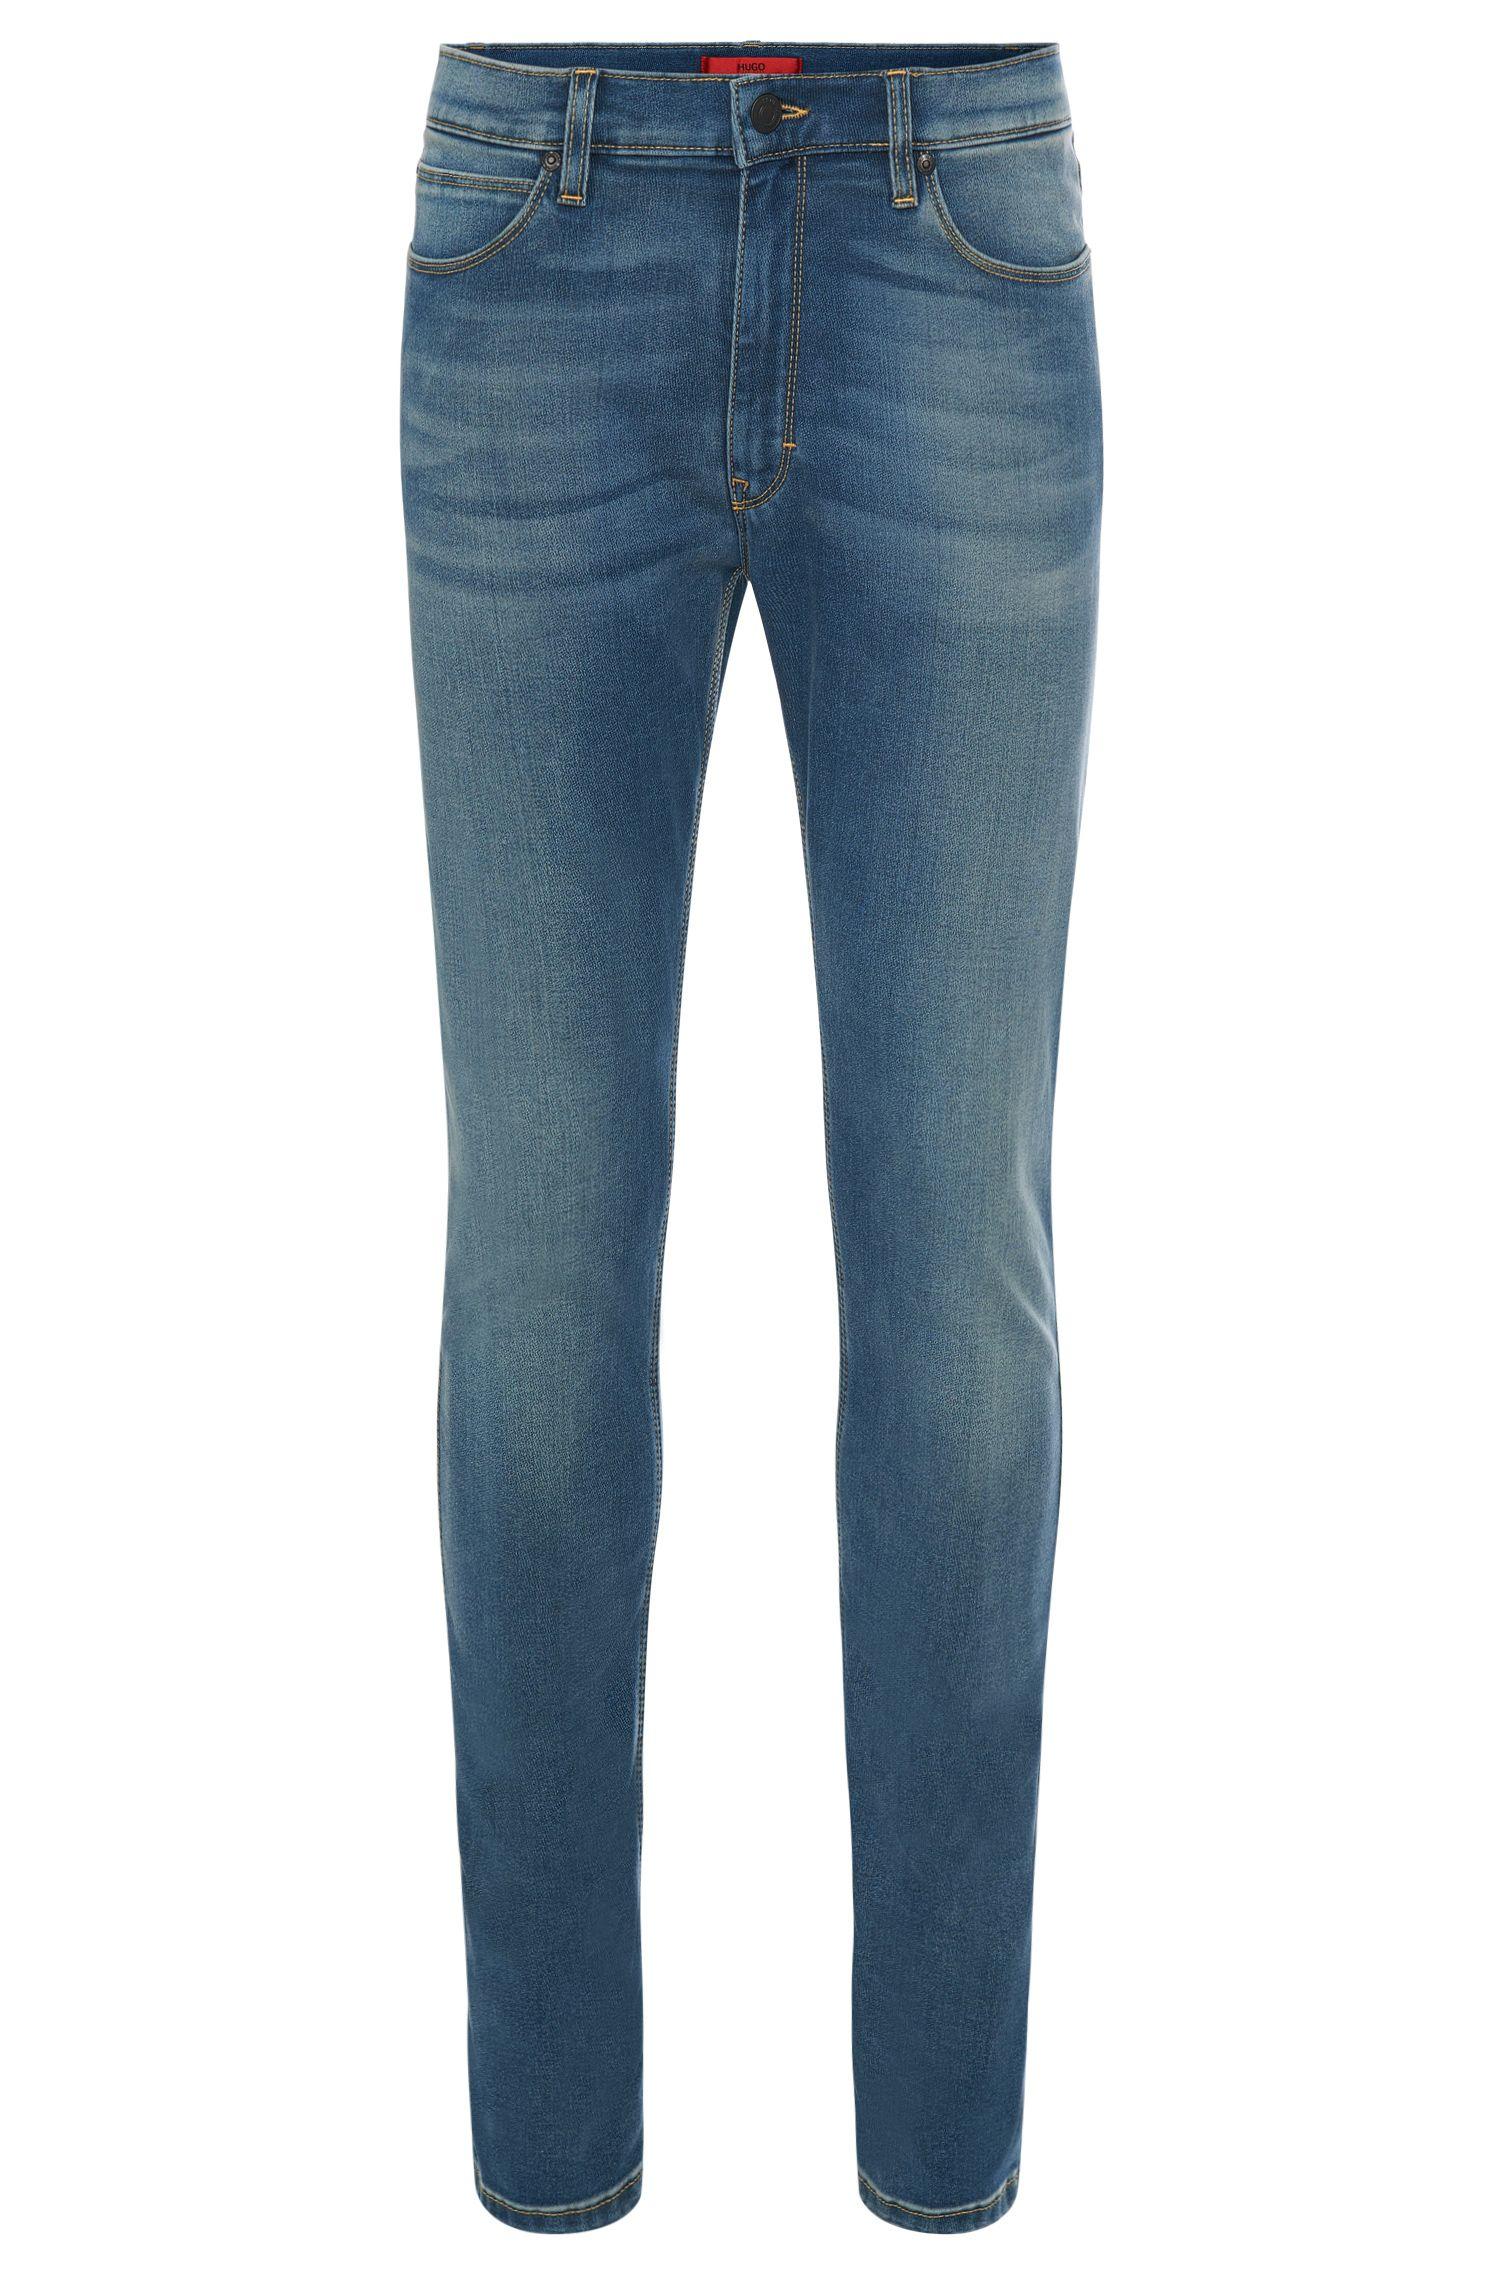 'HUGO 734' | Skinny Fit, 11.75 oz Stretch Cotton Blend Jeans